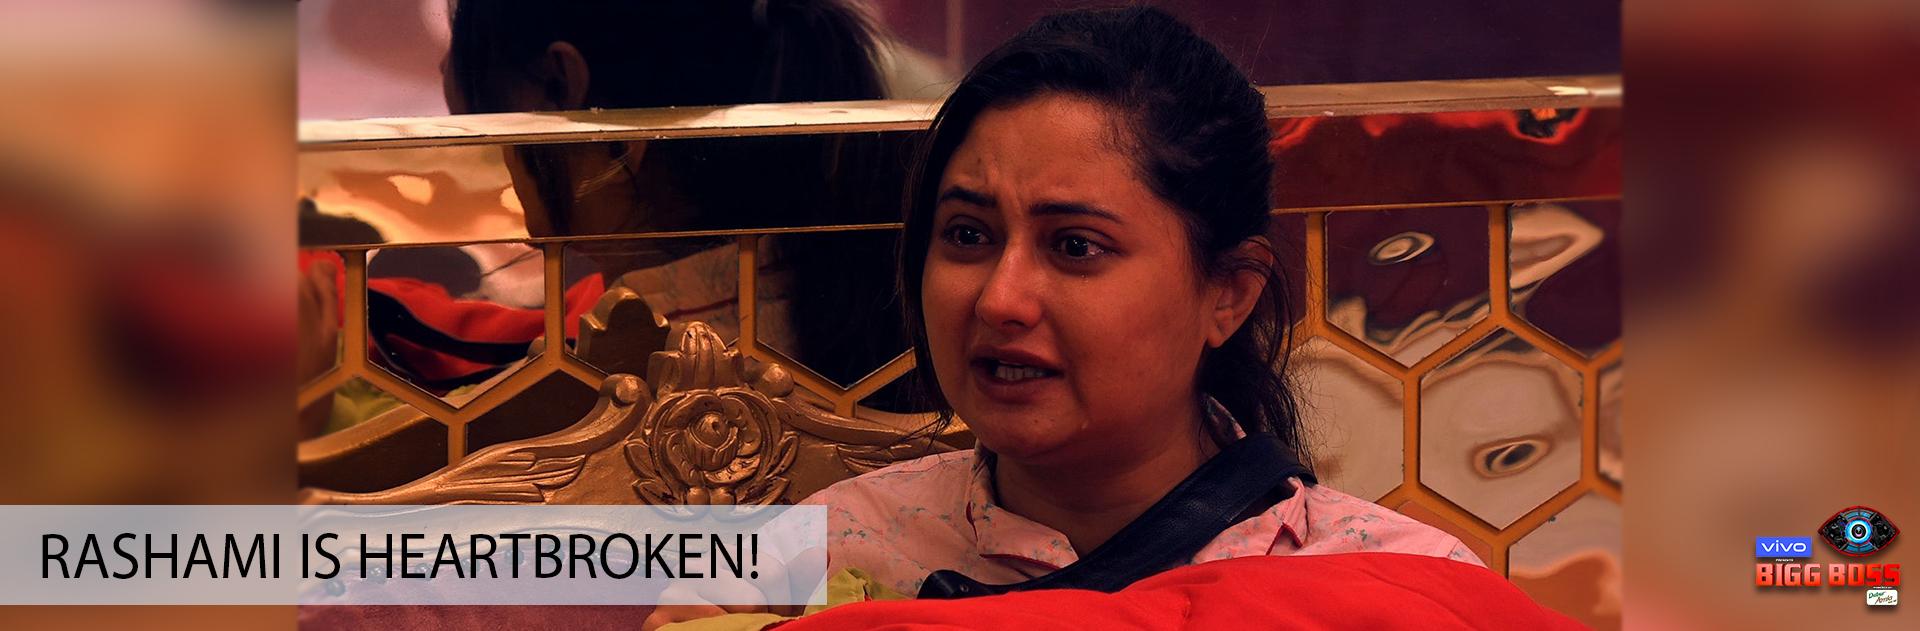 Rashami Desai digs into the past! #BiggBoss13